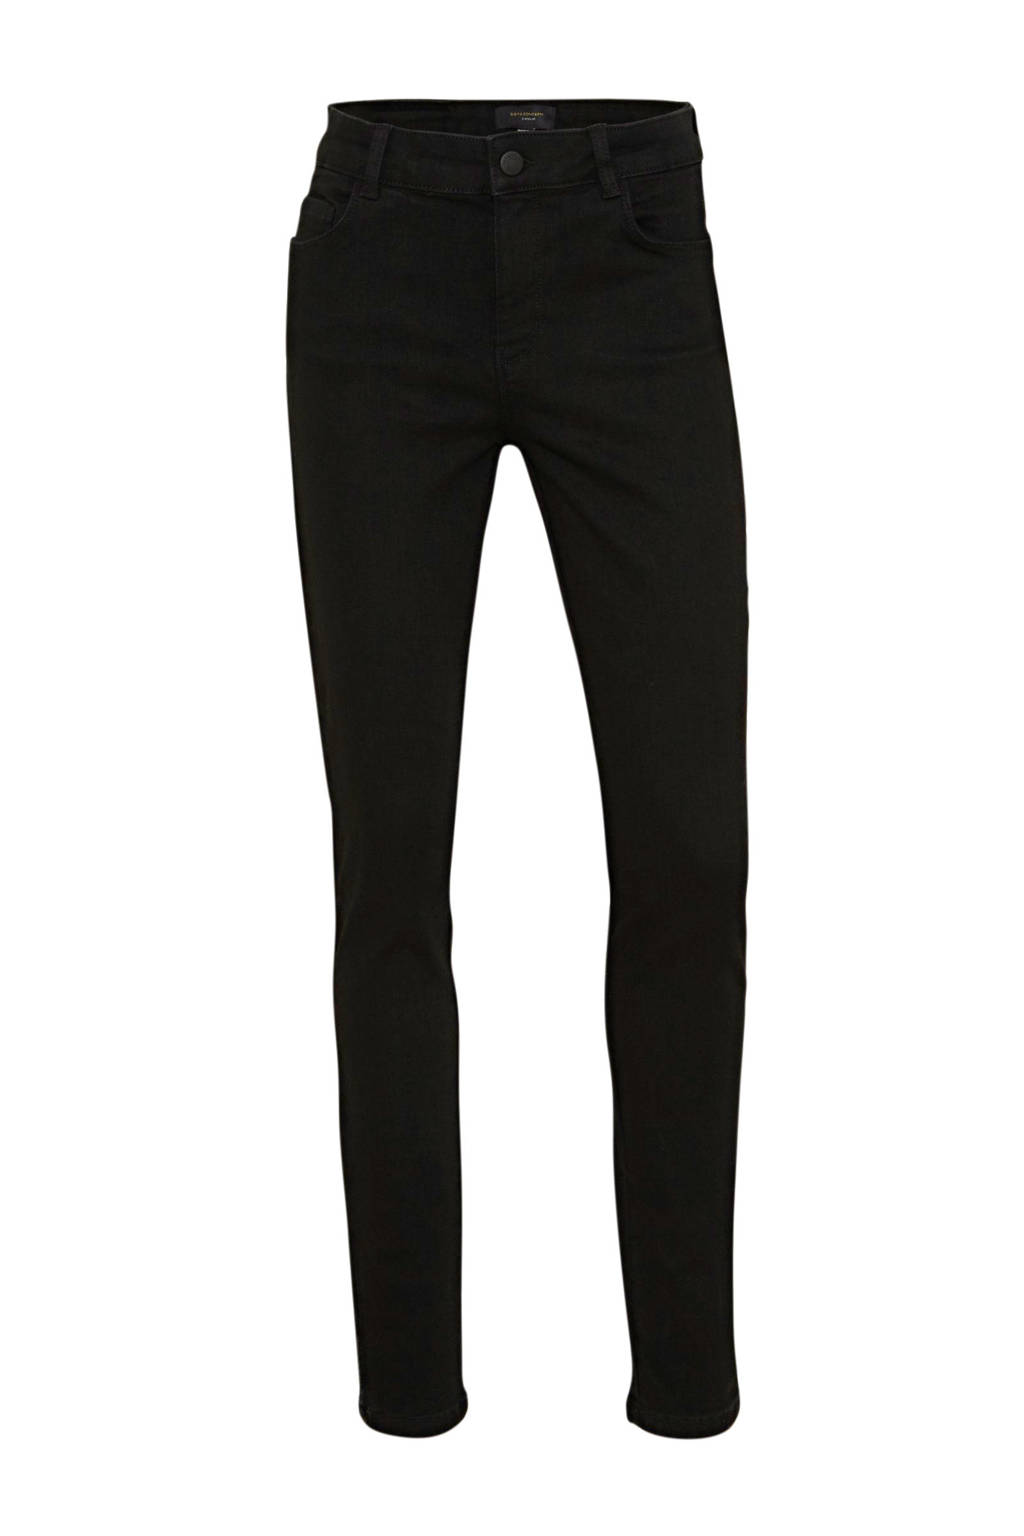 Soyaconcept skinny jeans SC-KIMBERLY PATRIZIA 1-B zwart, Zwart